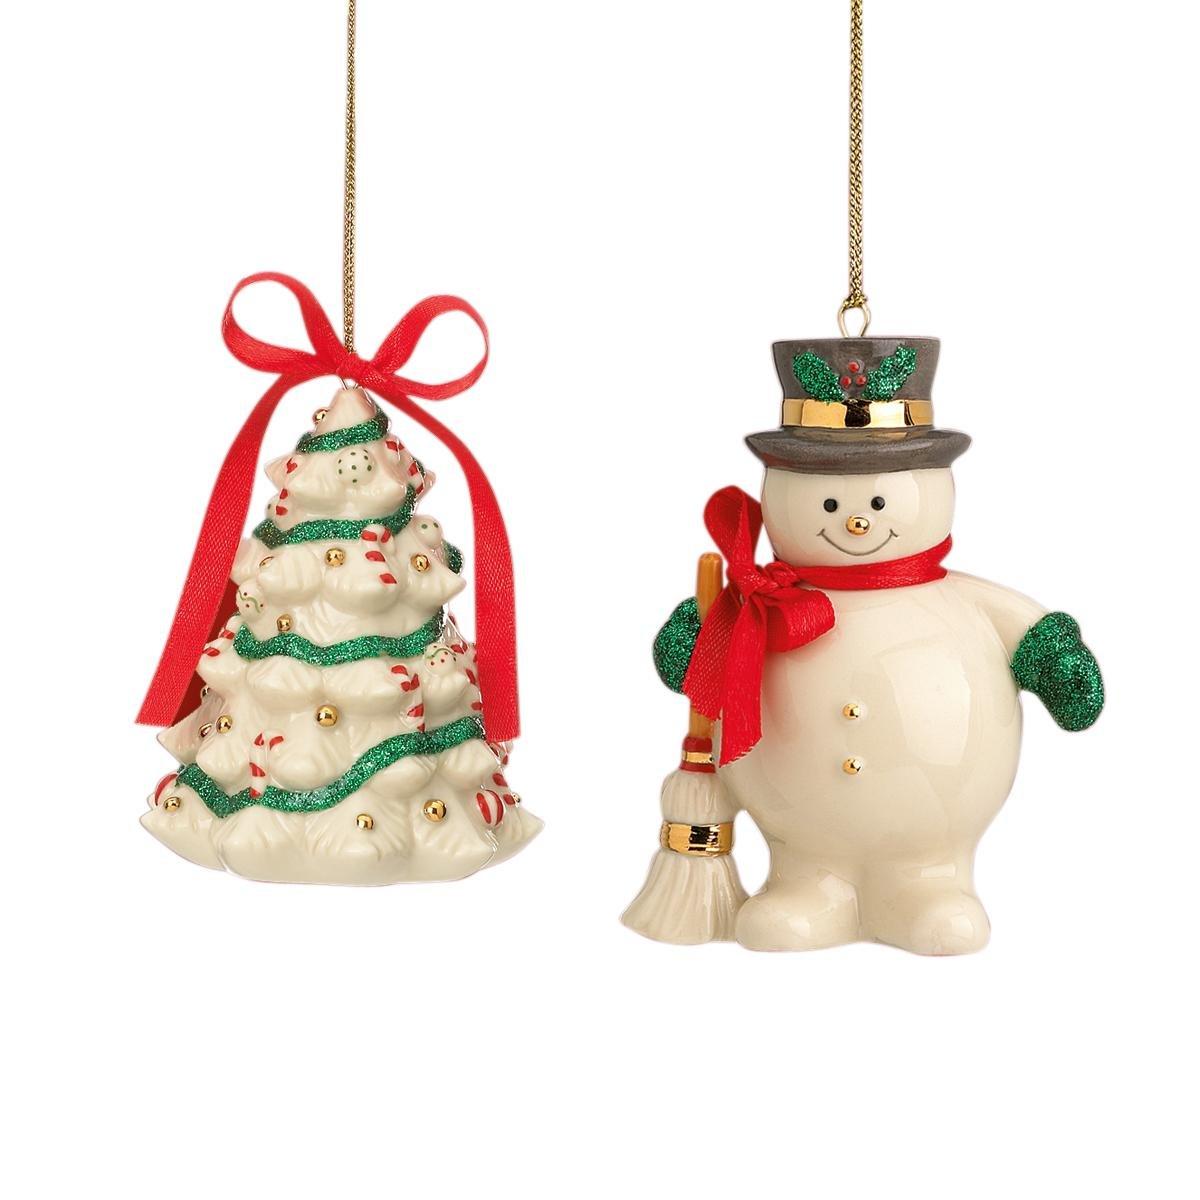 Lenox Christmas Ornaments.Lenox Holiday Ribbon S 2 Christmas Ornaments